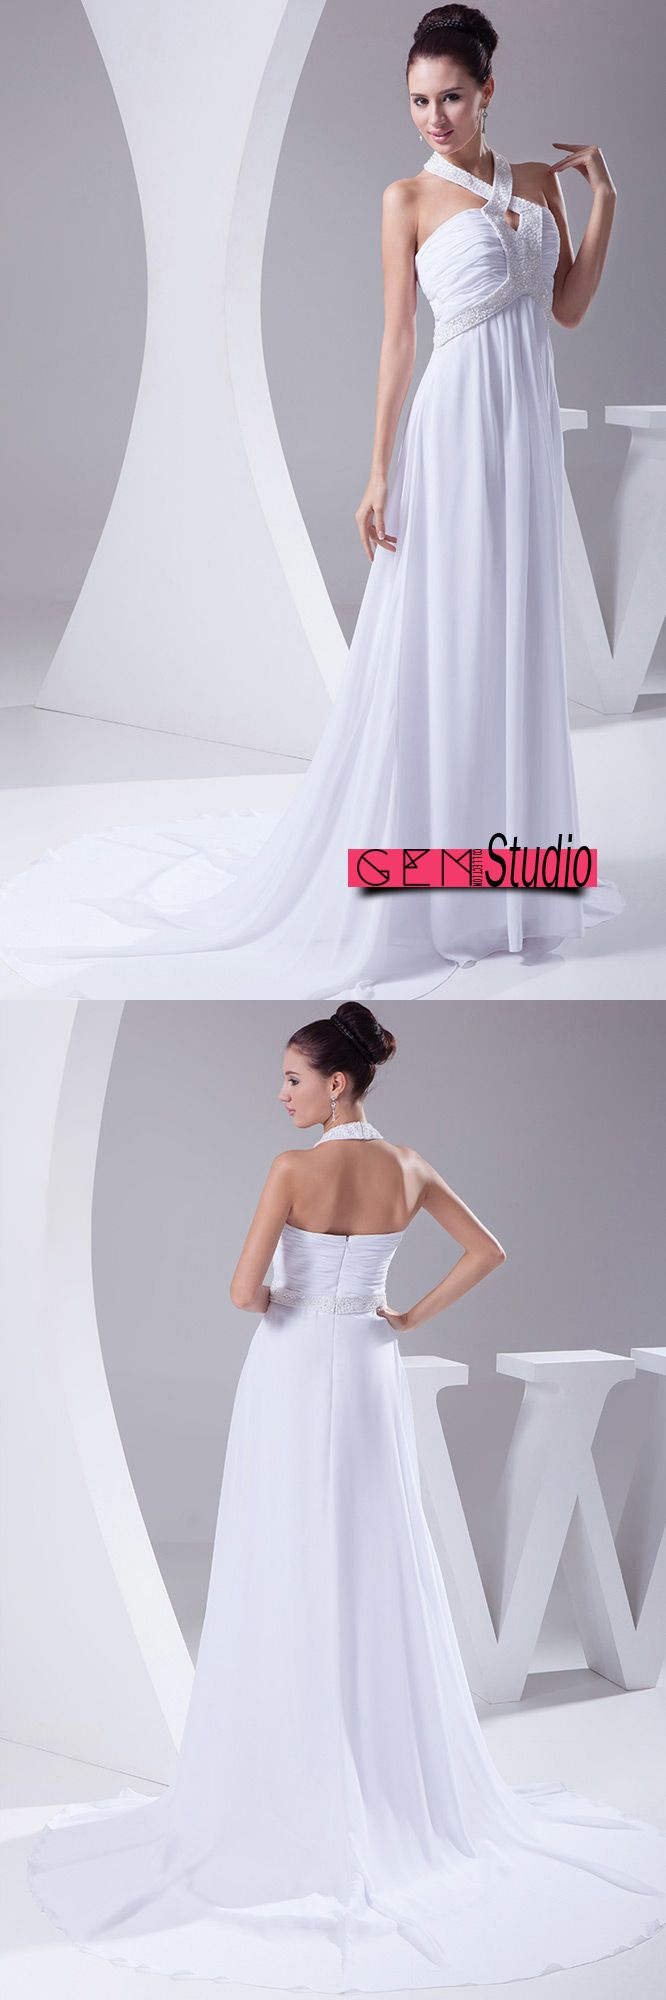 Plain white long halter beading chiffon wedding dress with train